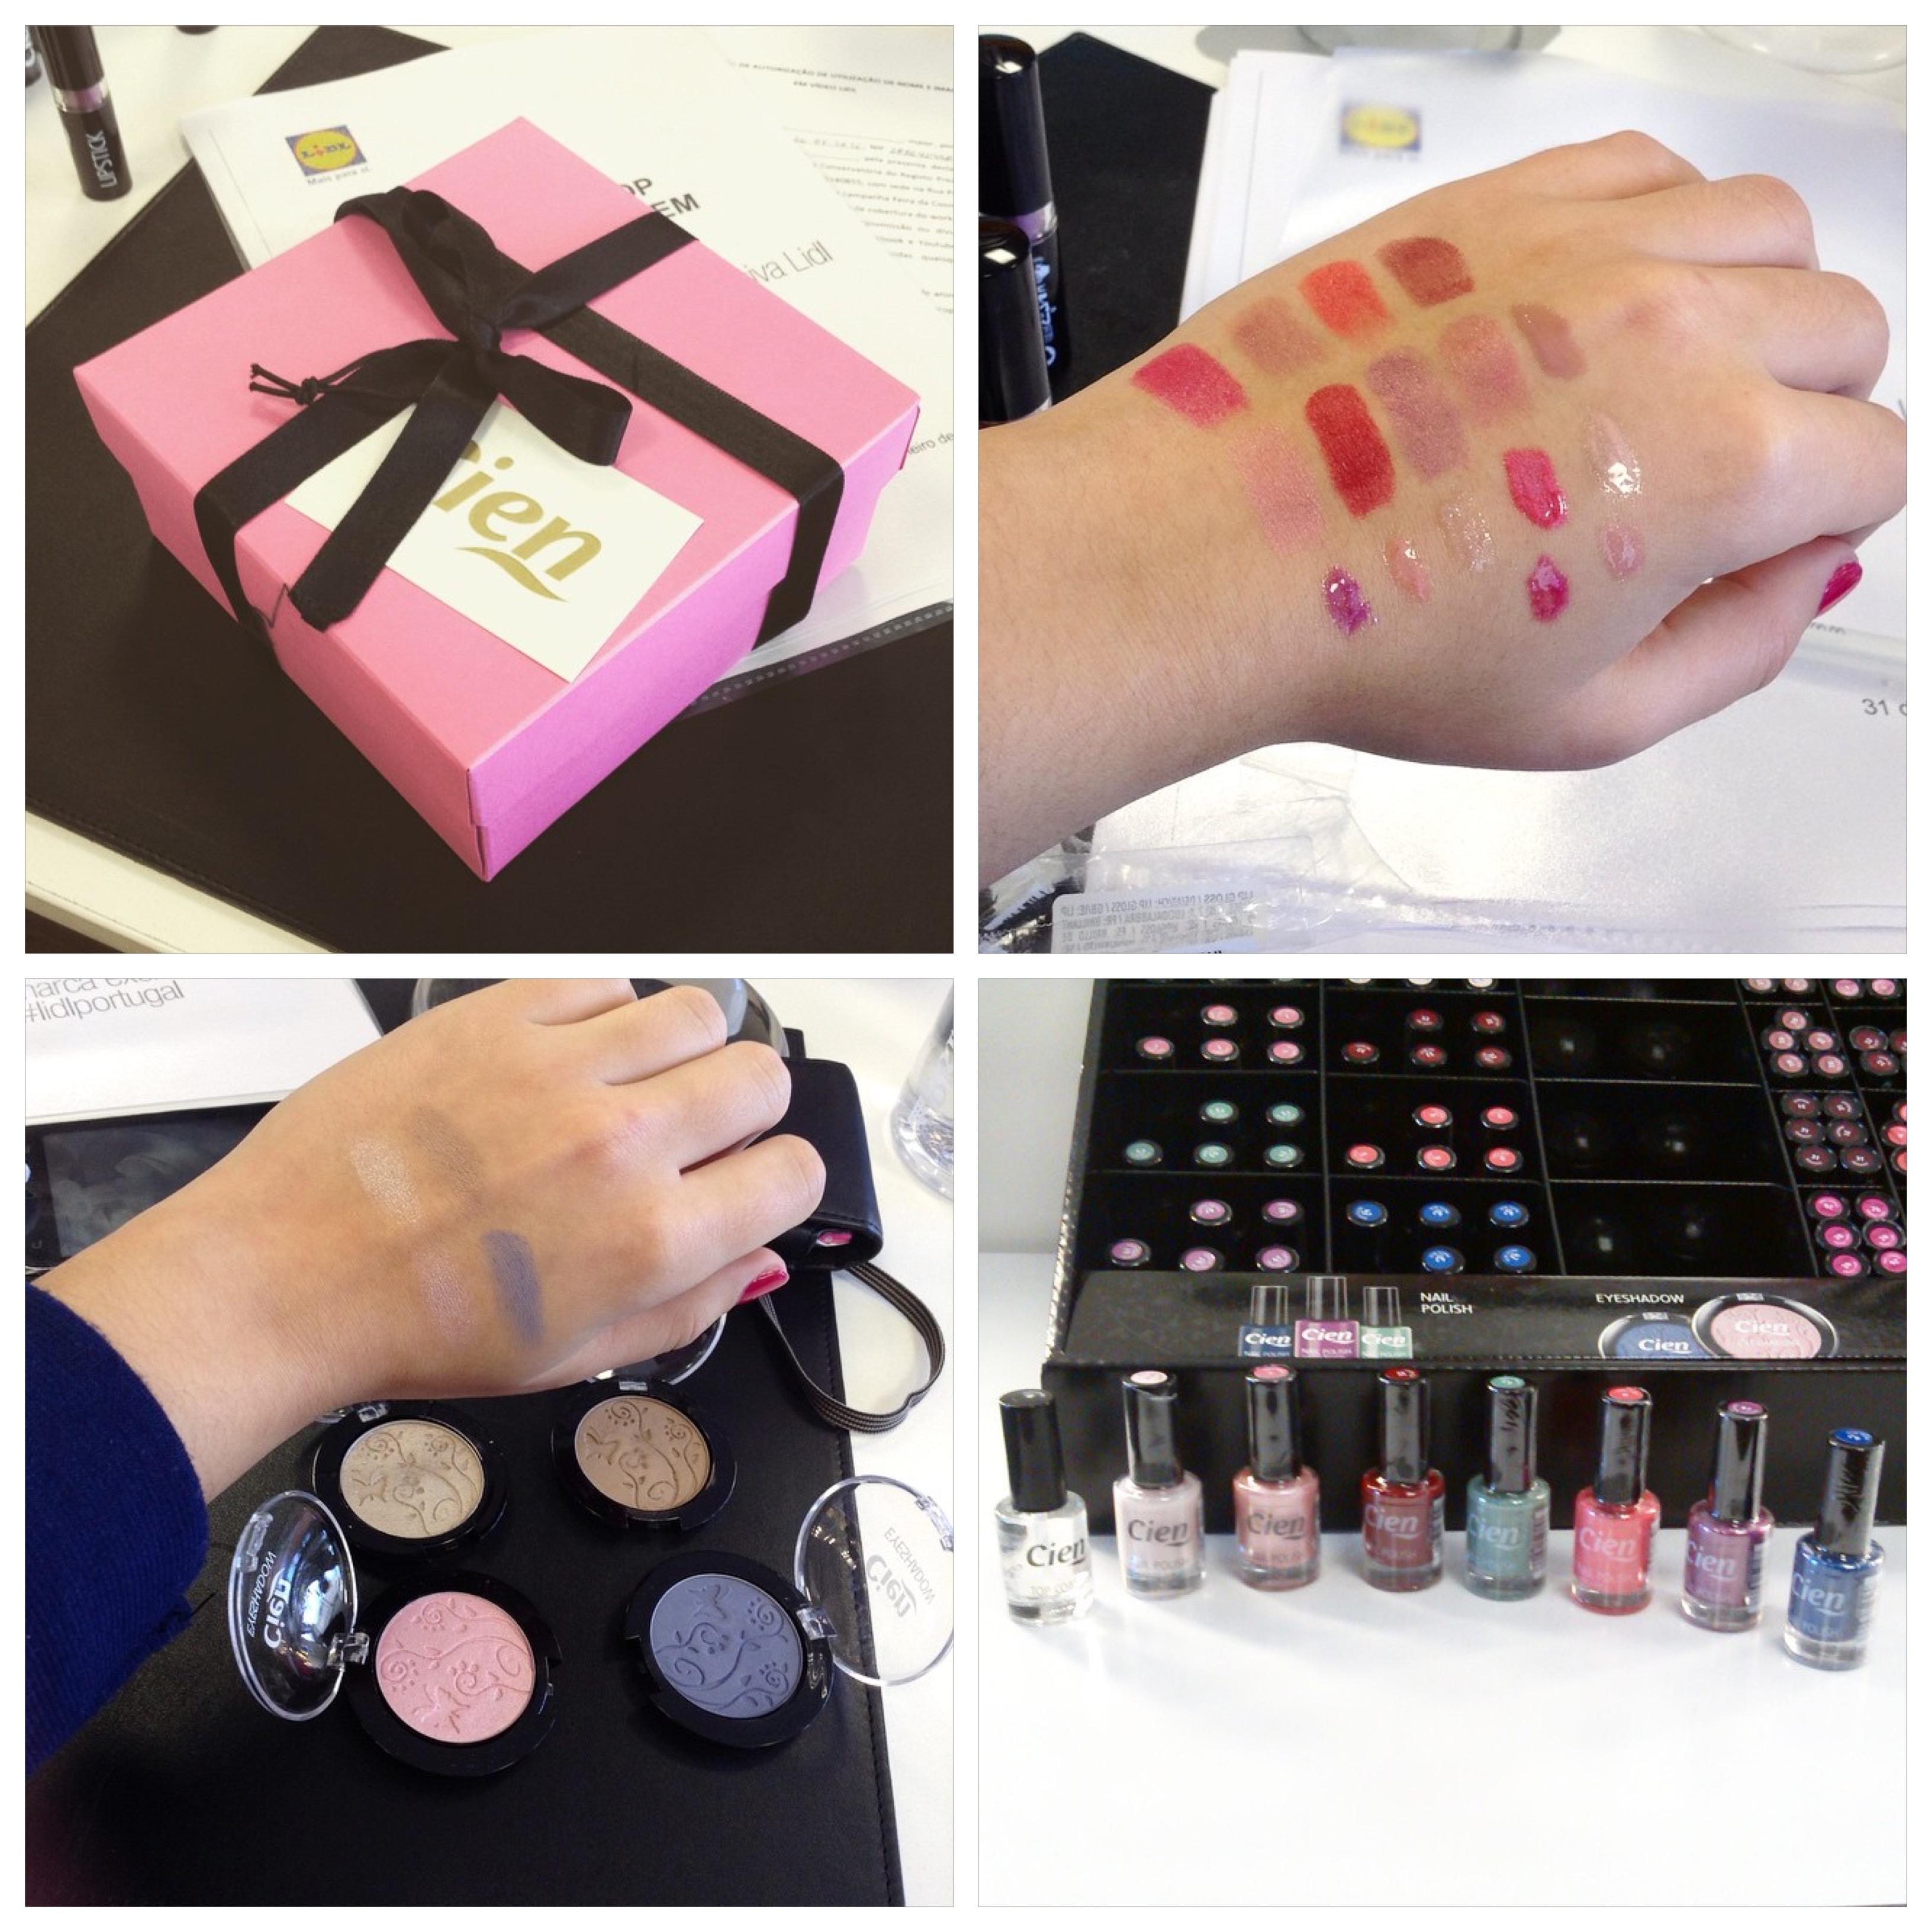 lidl maquilhagem cien makeup beauty beleza review swatch opinião resenha blog workshop maquilhagem